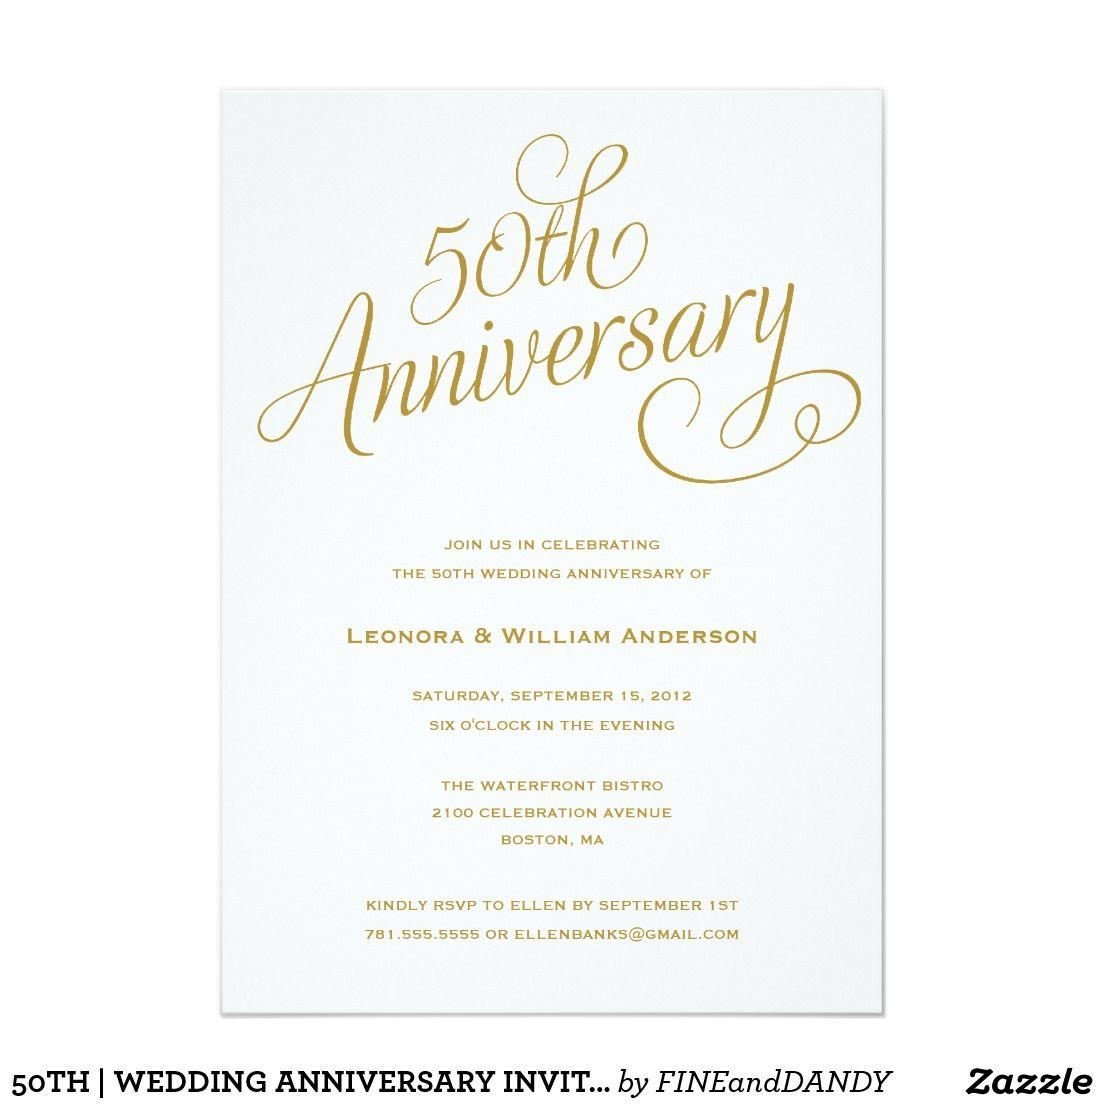 50th | wedding anniversary invitations | 50th wedding anniversary ...